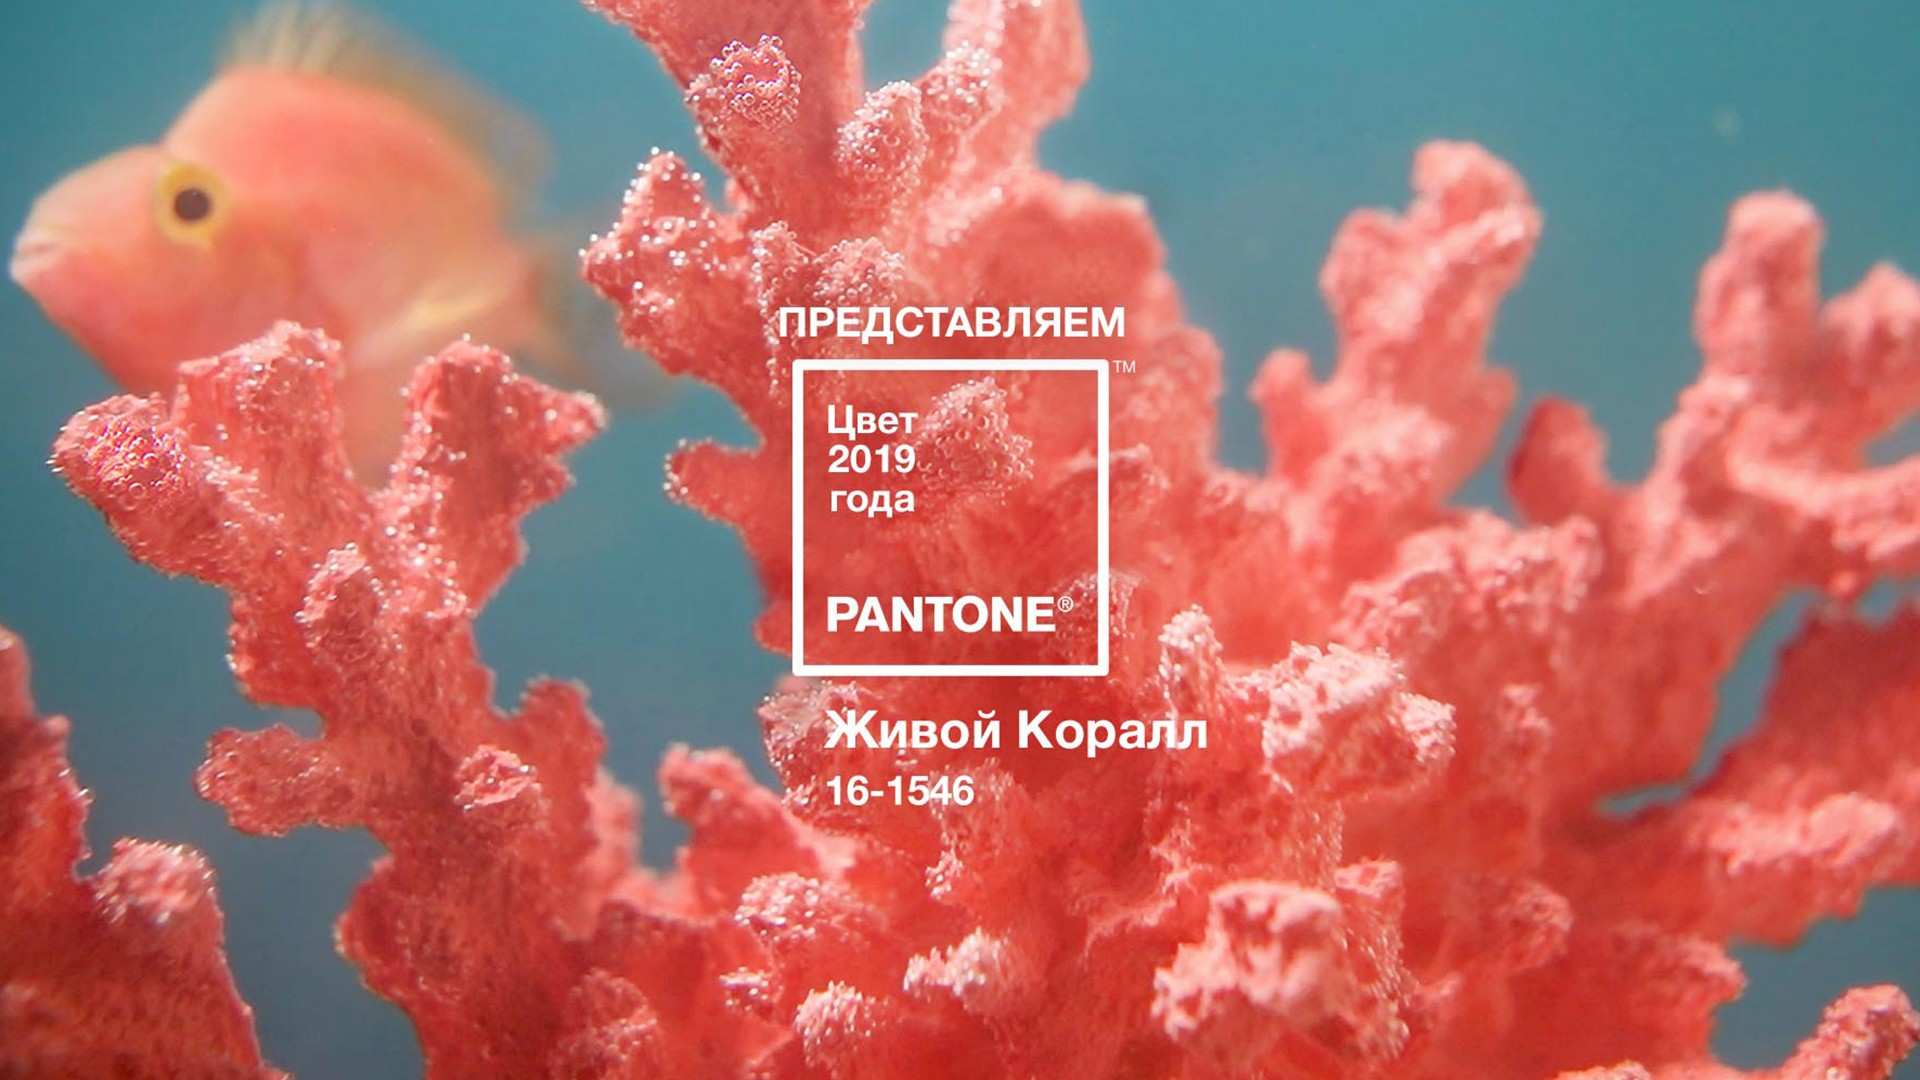 Институт Pantone определил цвет 2019 года